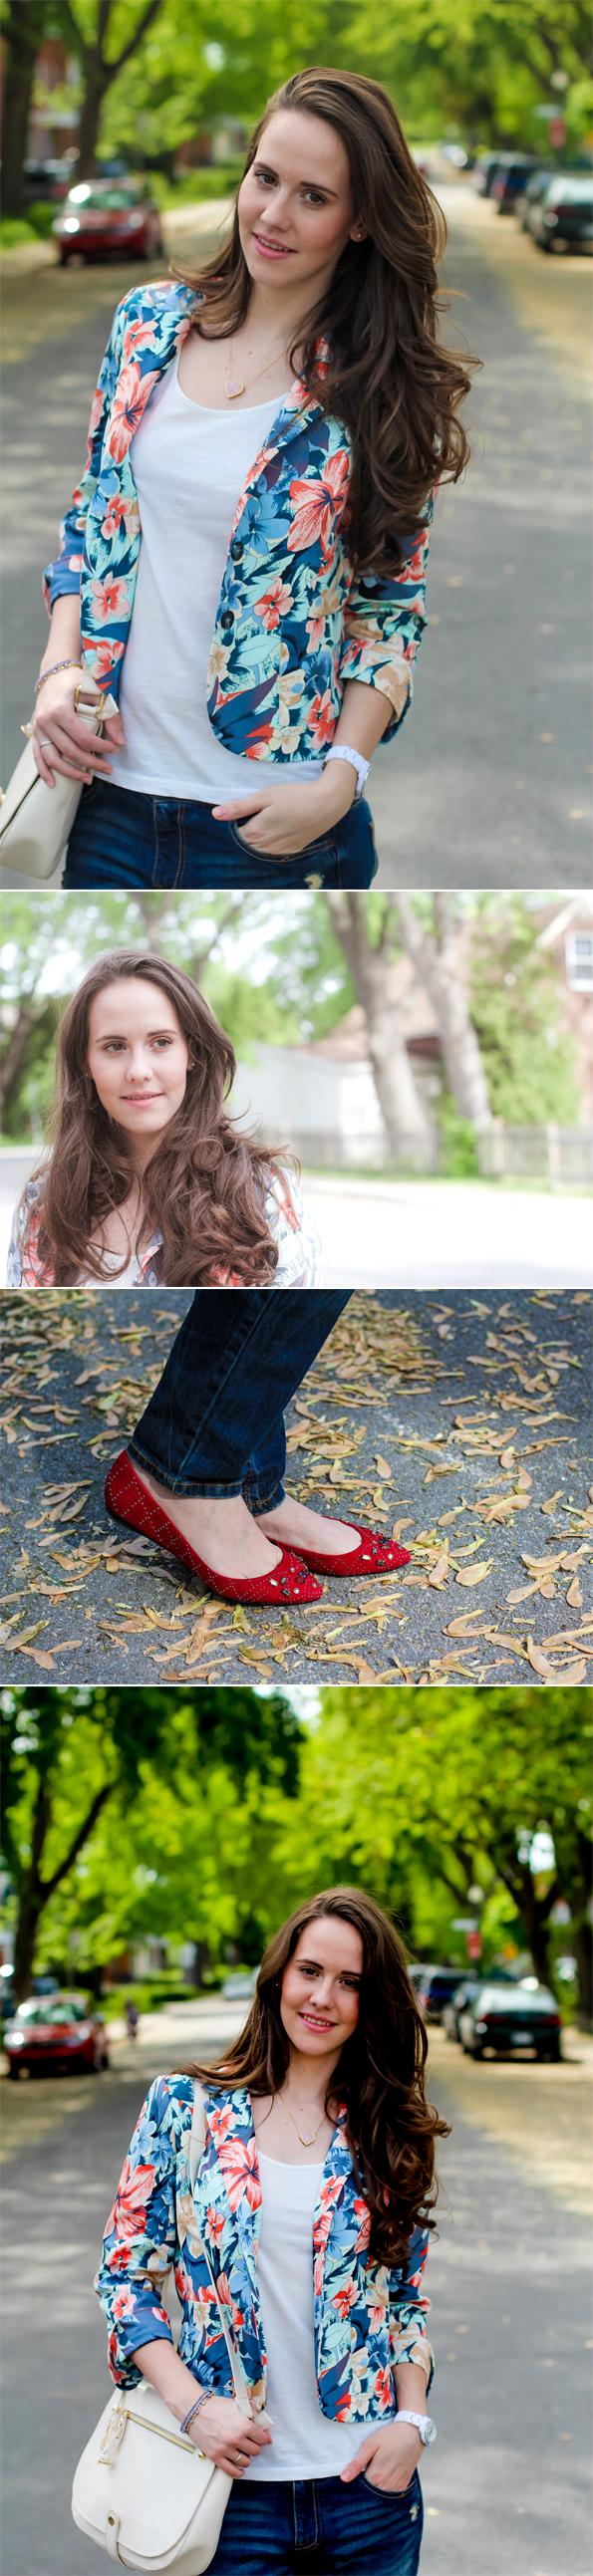 Blazer Florido - Primavera - Look do Dia - OOTD - Sue Brandao